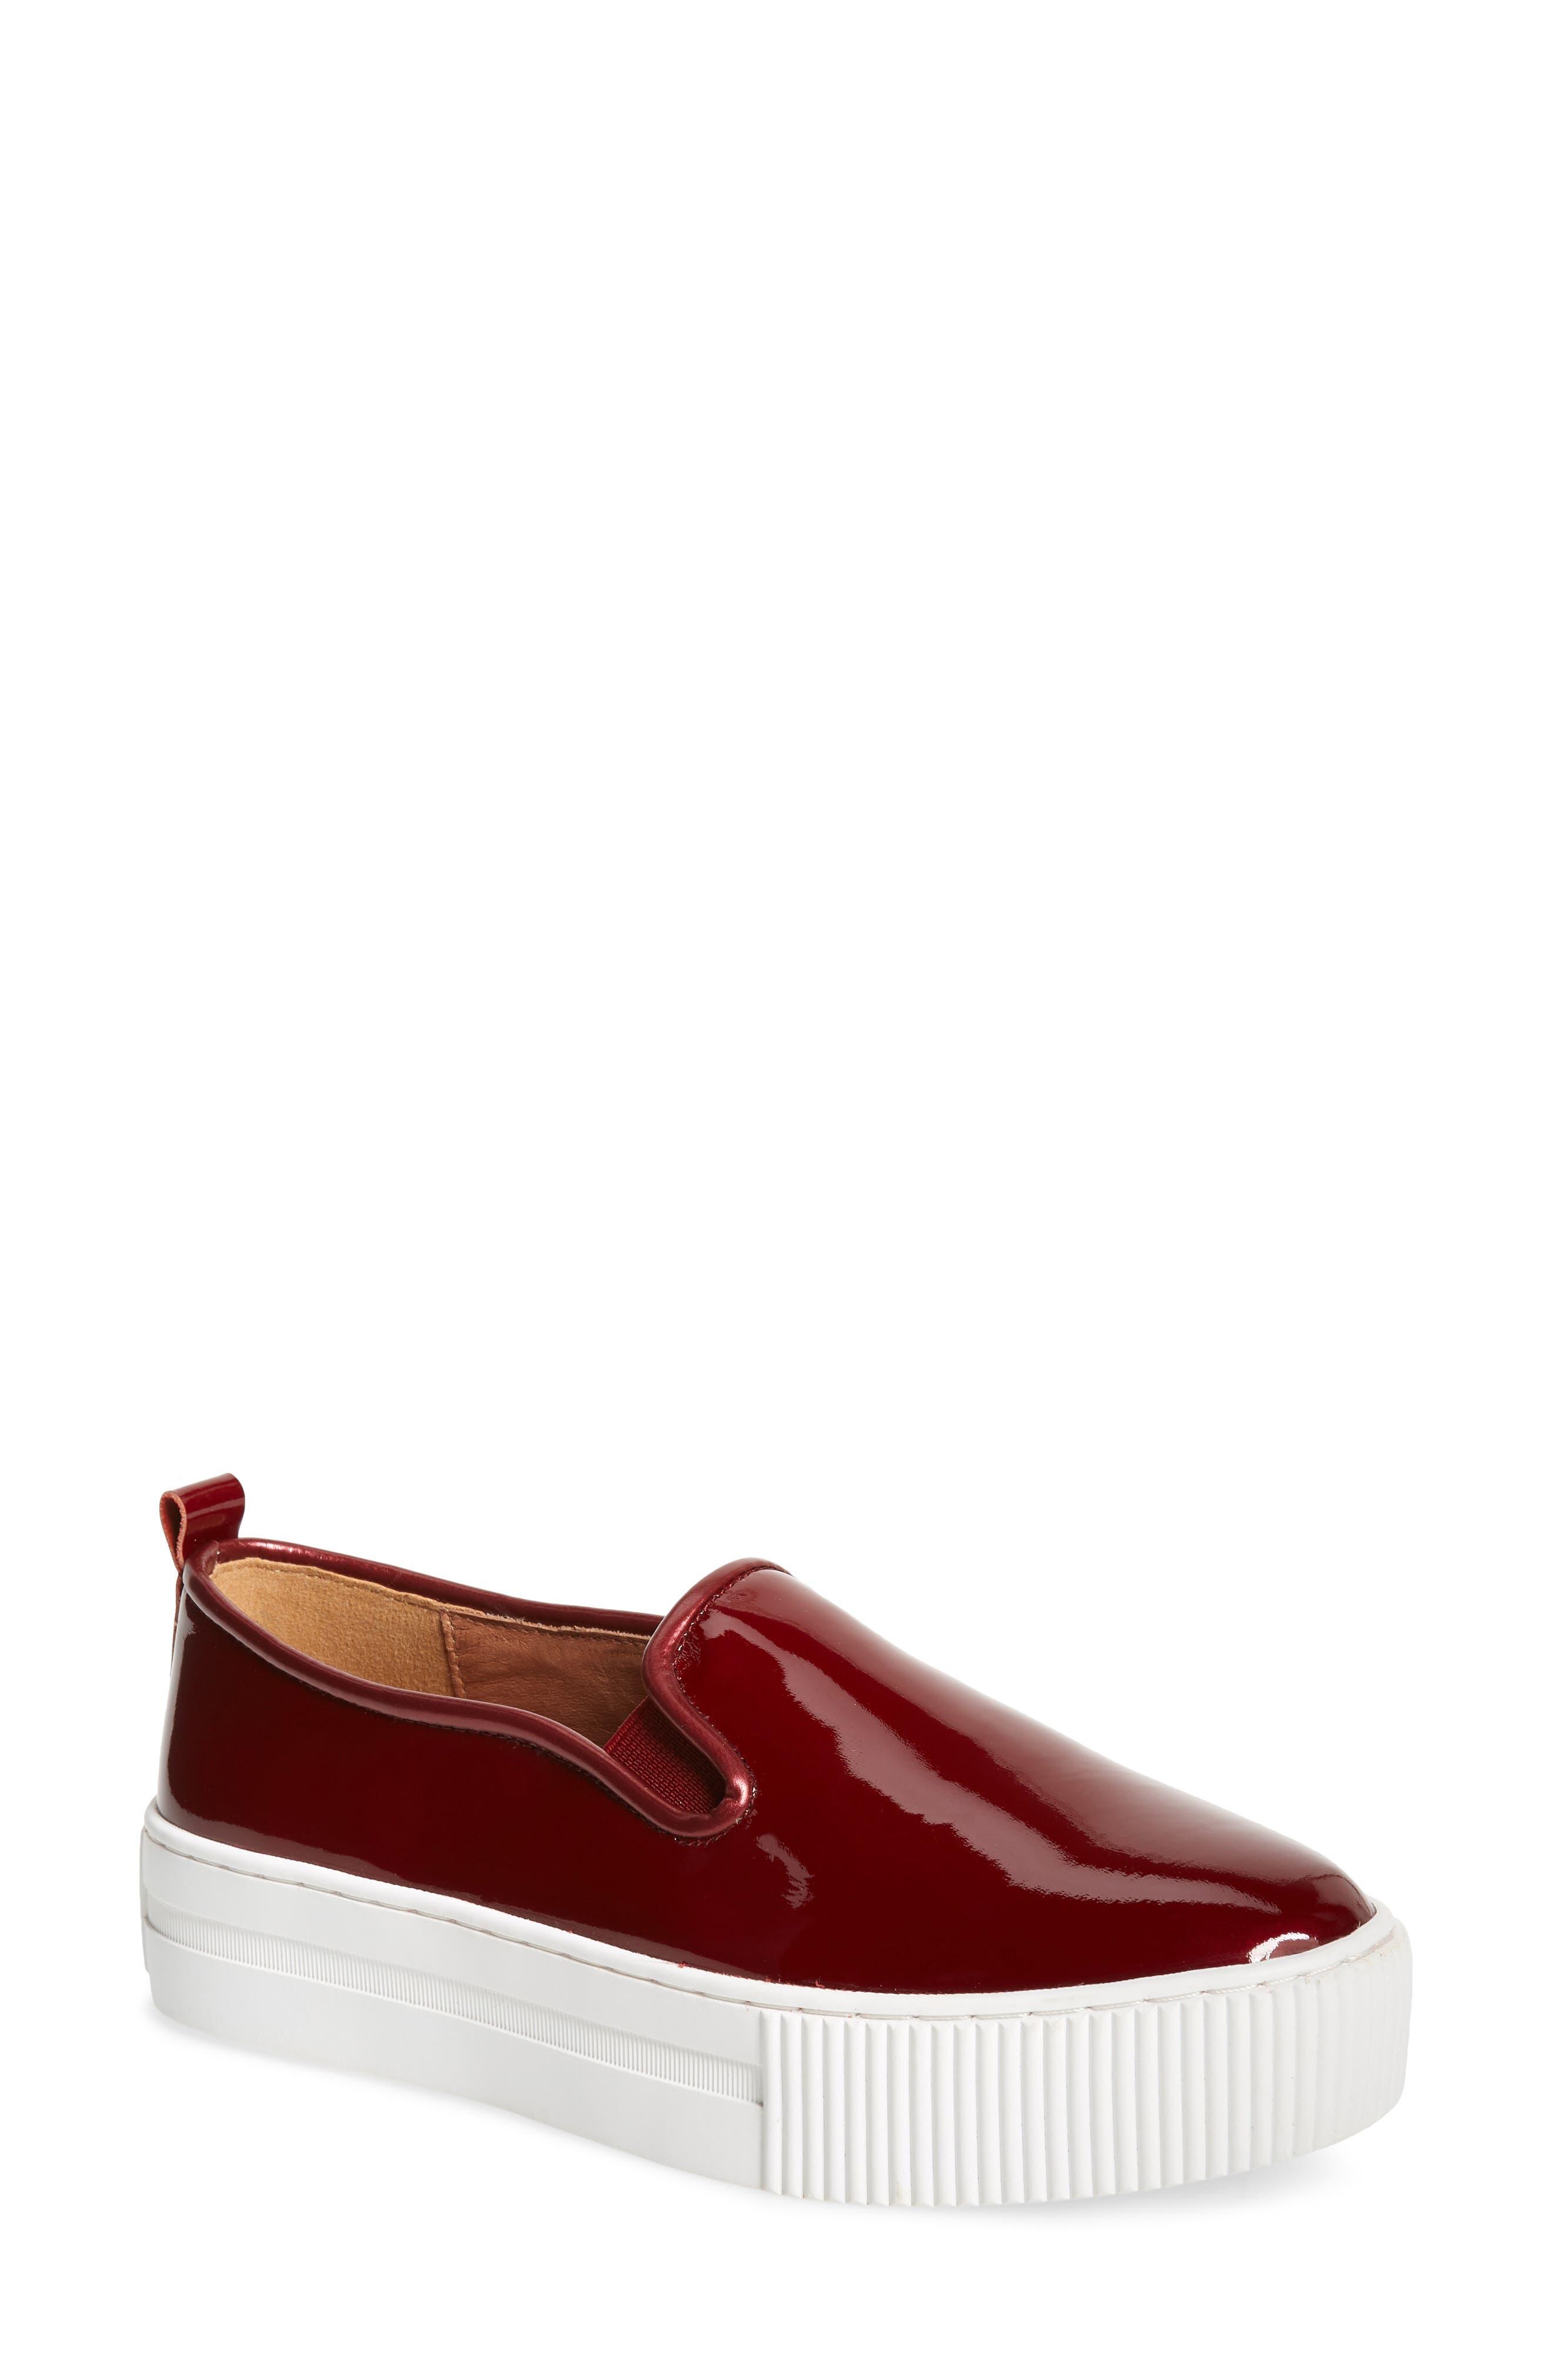 Baylee Platform Slip-On Sneaker,                             Main thumbnail 1, color,                             930